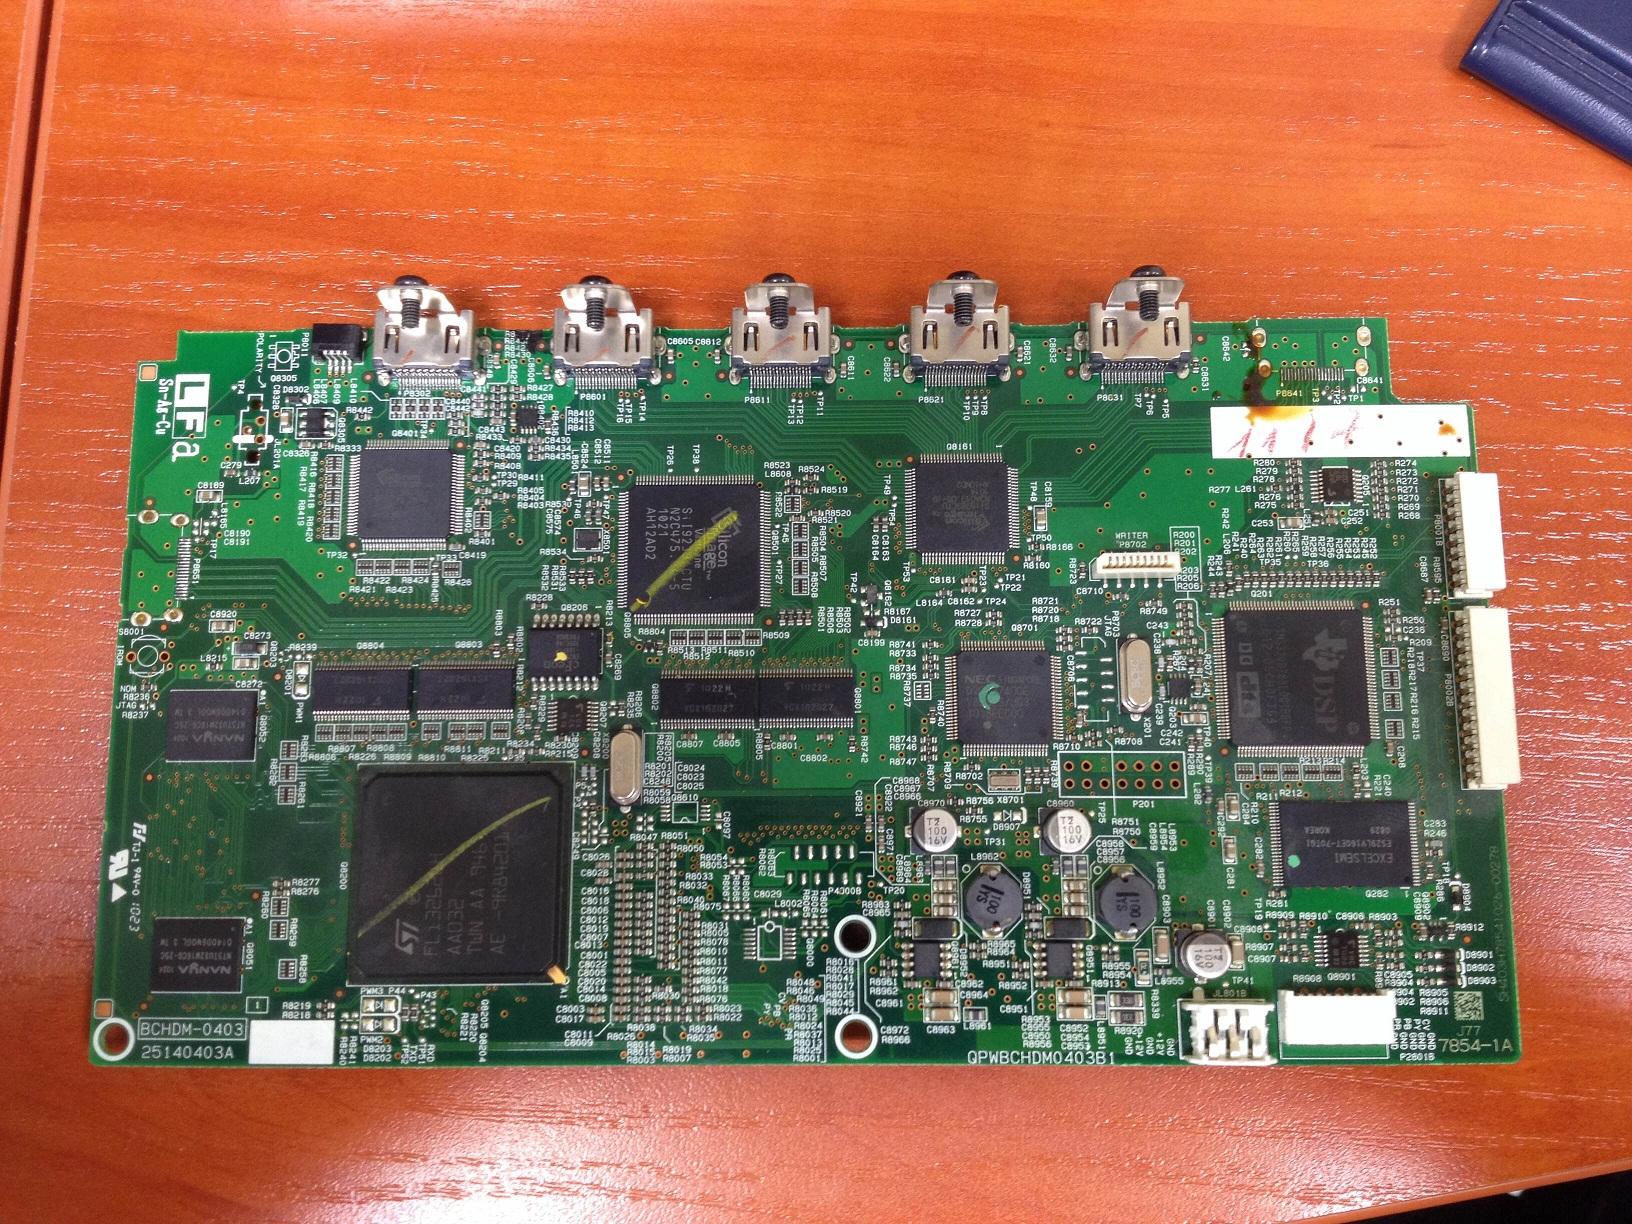 Amplituner Onkyo TX-SR578 Brak sygna�u na HDMI - wej�cia i wyj�cia